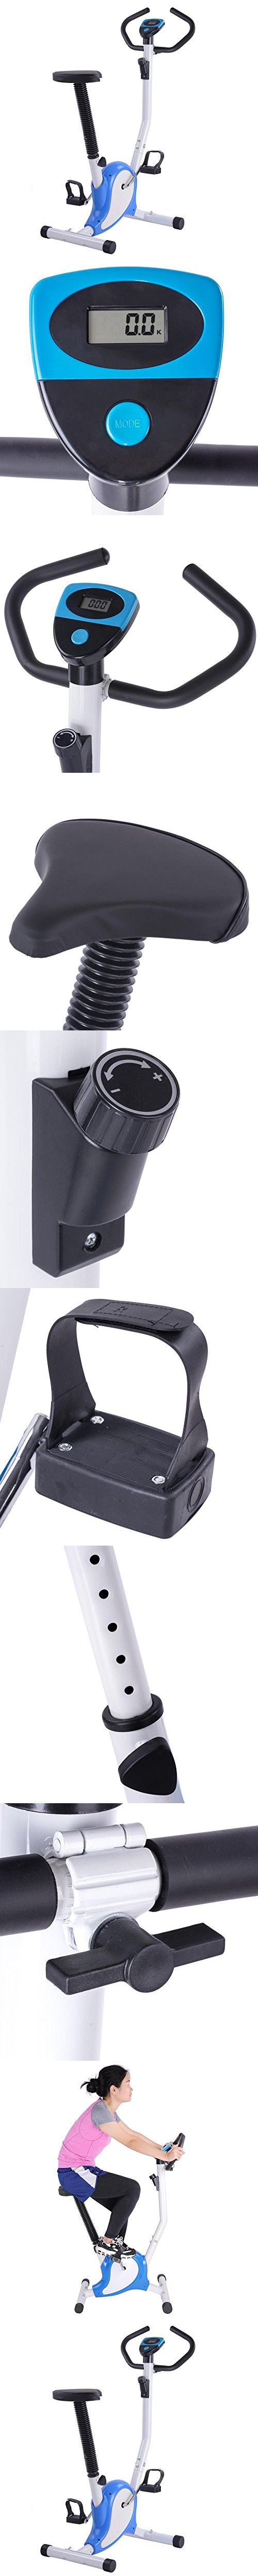 AW Blue Exercise Bike Fintess Cycling Machine w/ LCD Display Personal Gym Cardio Aerobic Equipment